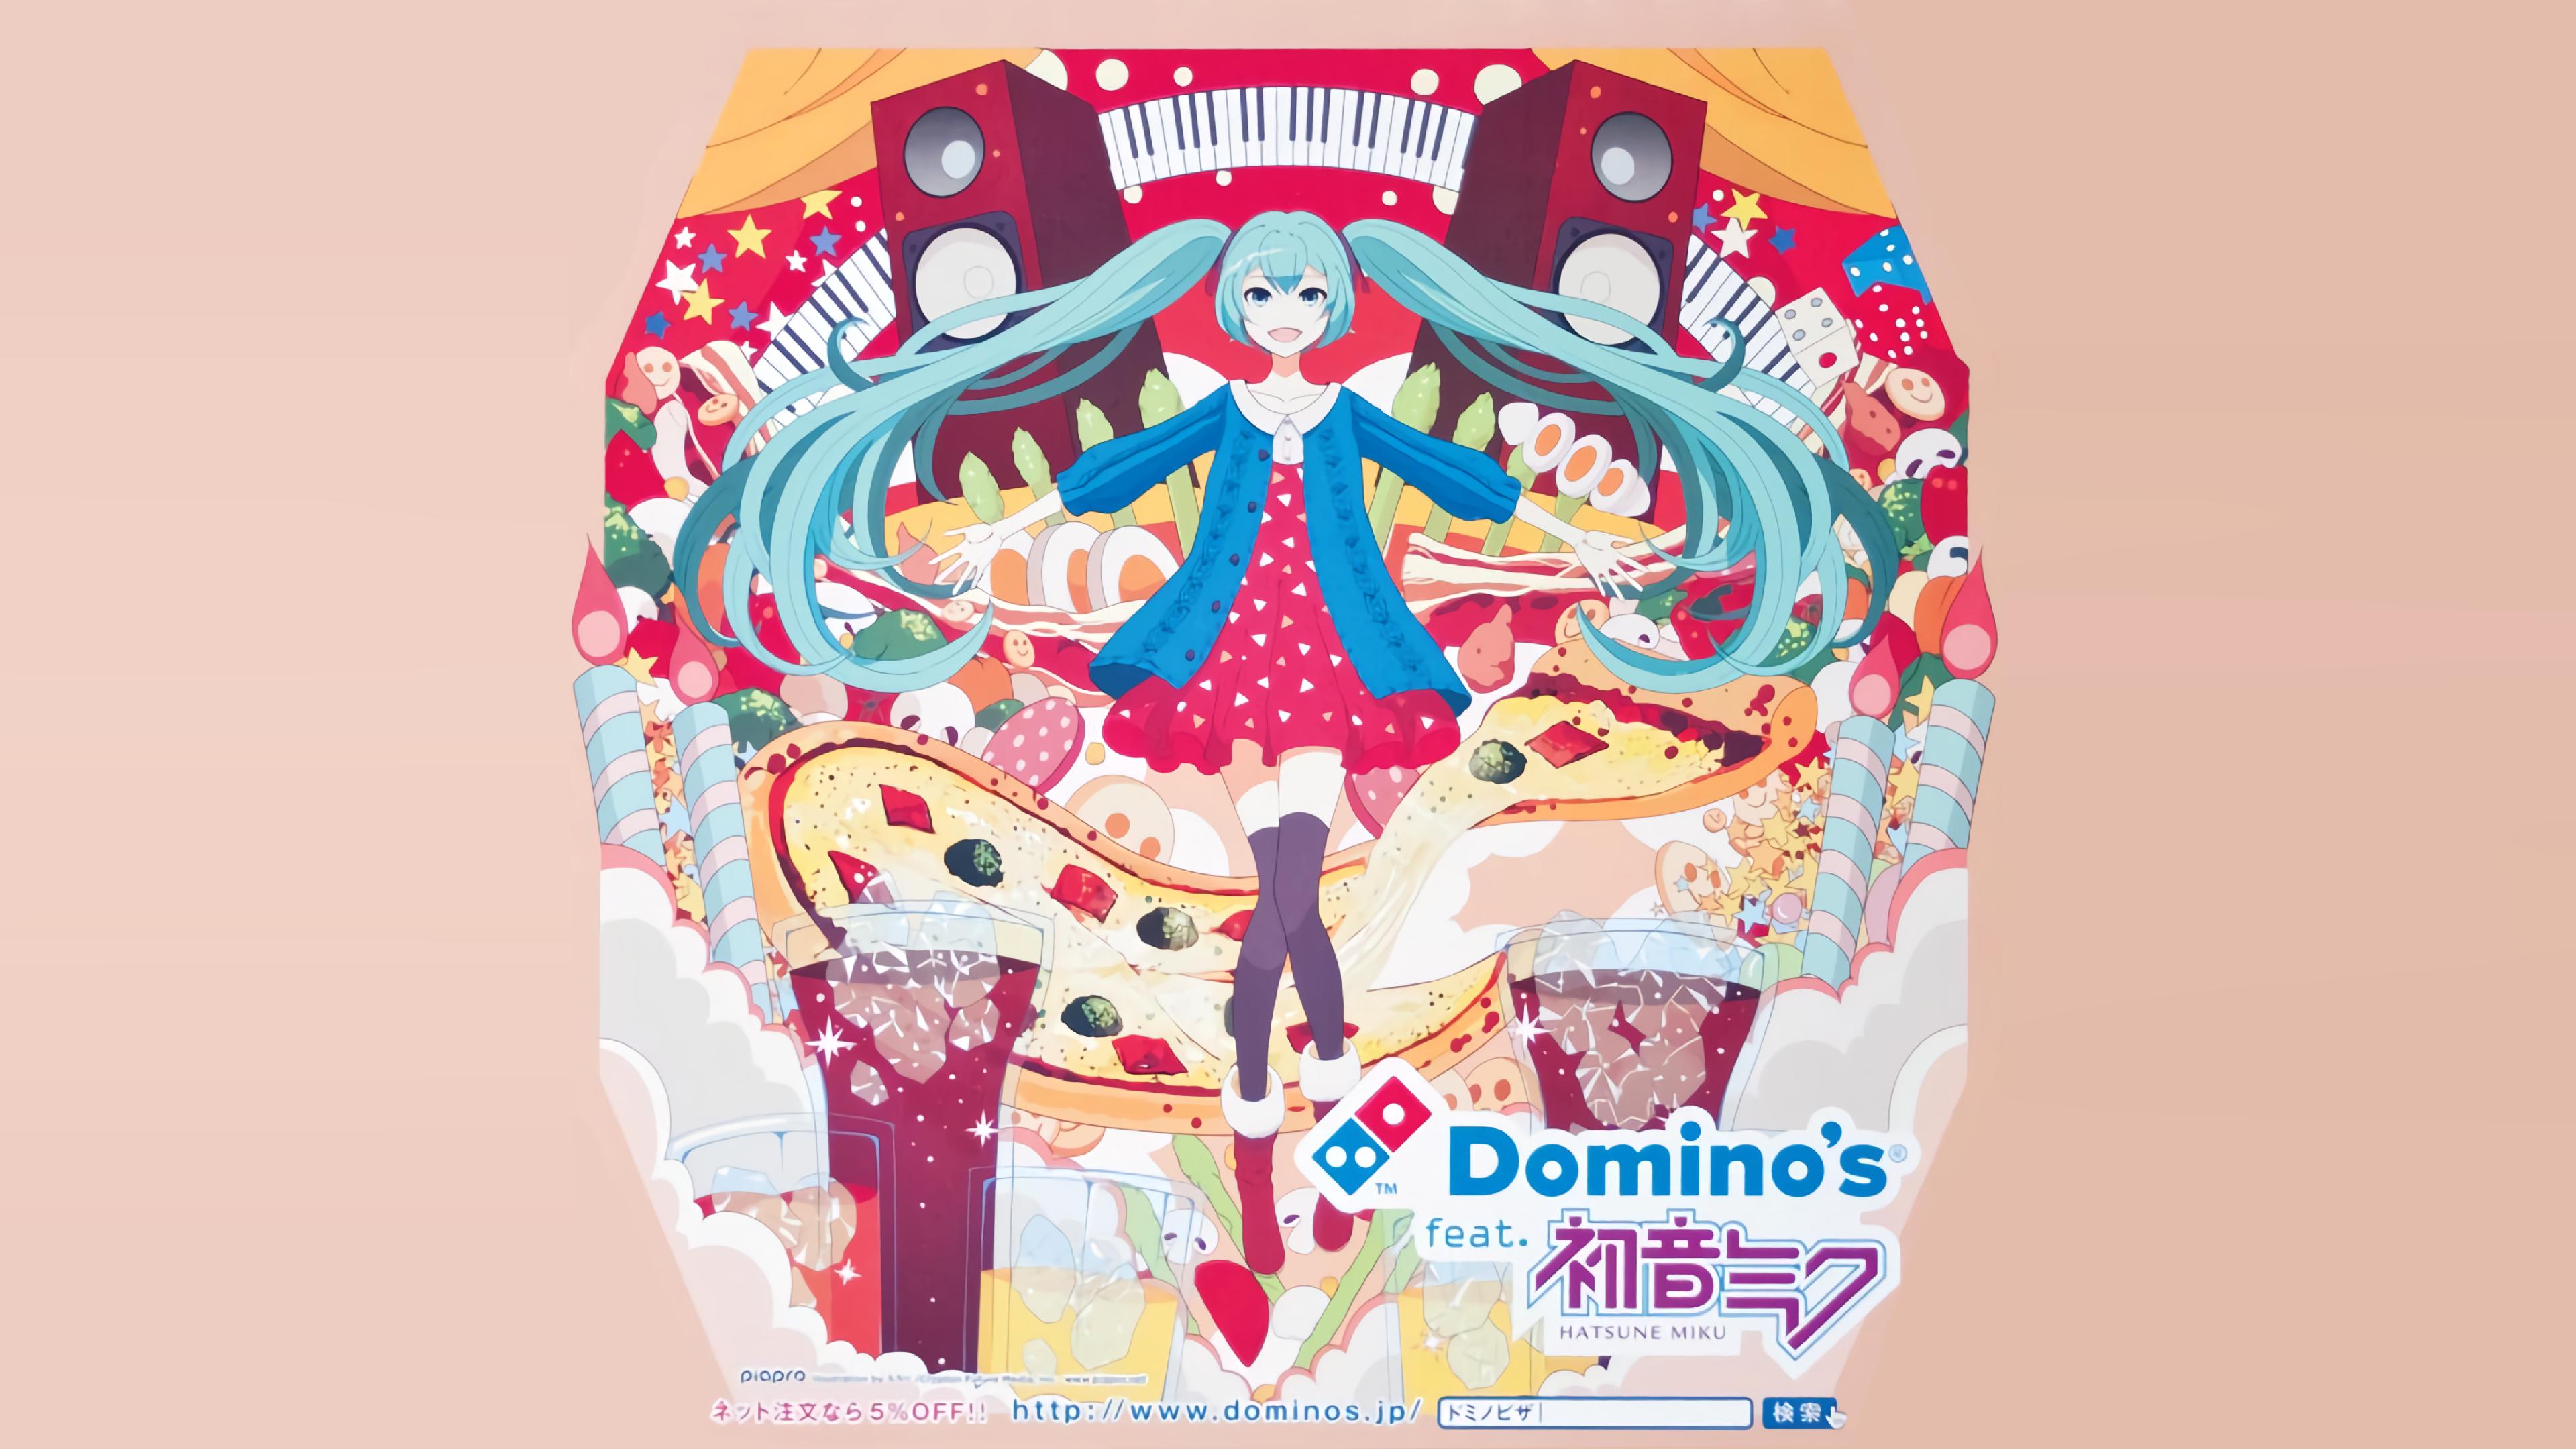 3840x2160 Domino S Feat Hatsune Miku Pizza Box Full Credits To U Luiginub1 Hatsune Miku Domino Active Wallpaper